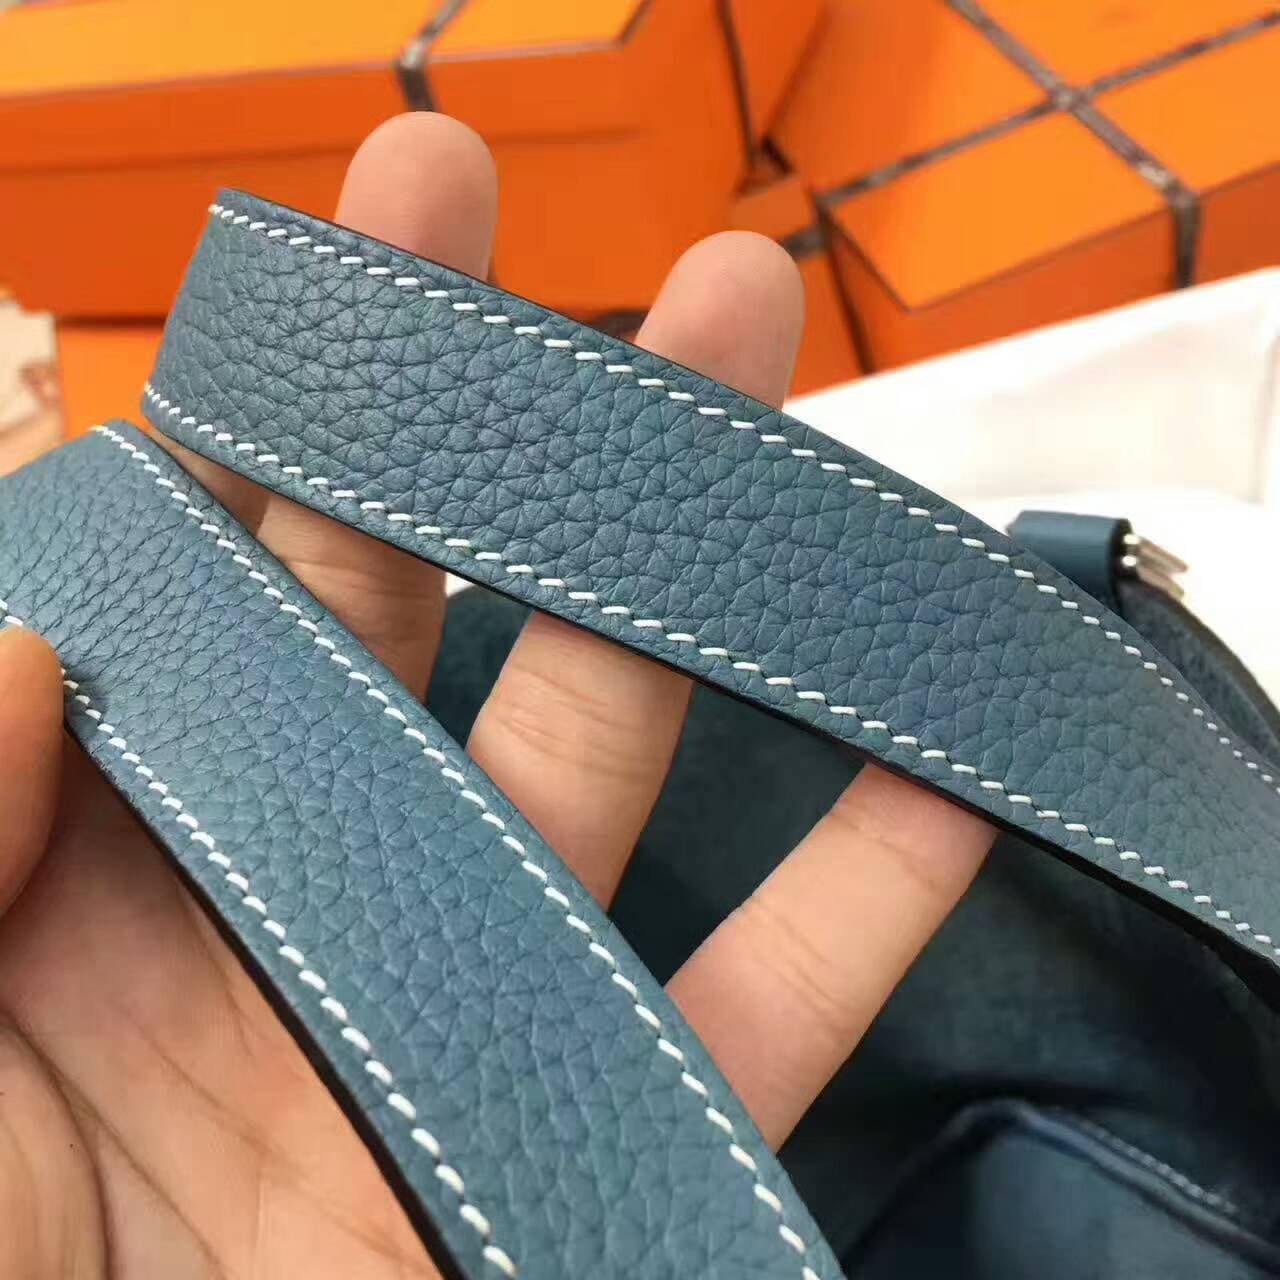 Hermes菜篮子 手工蜡线 18-22cm Togo皮 牛仔蓝 时尚又实用